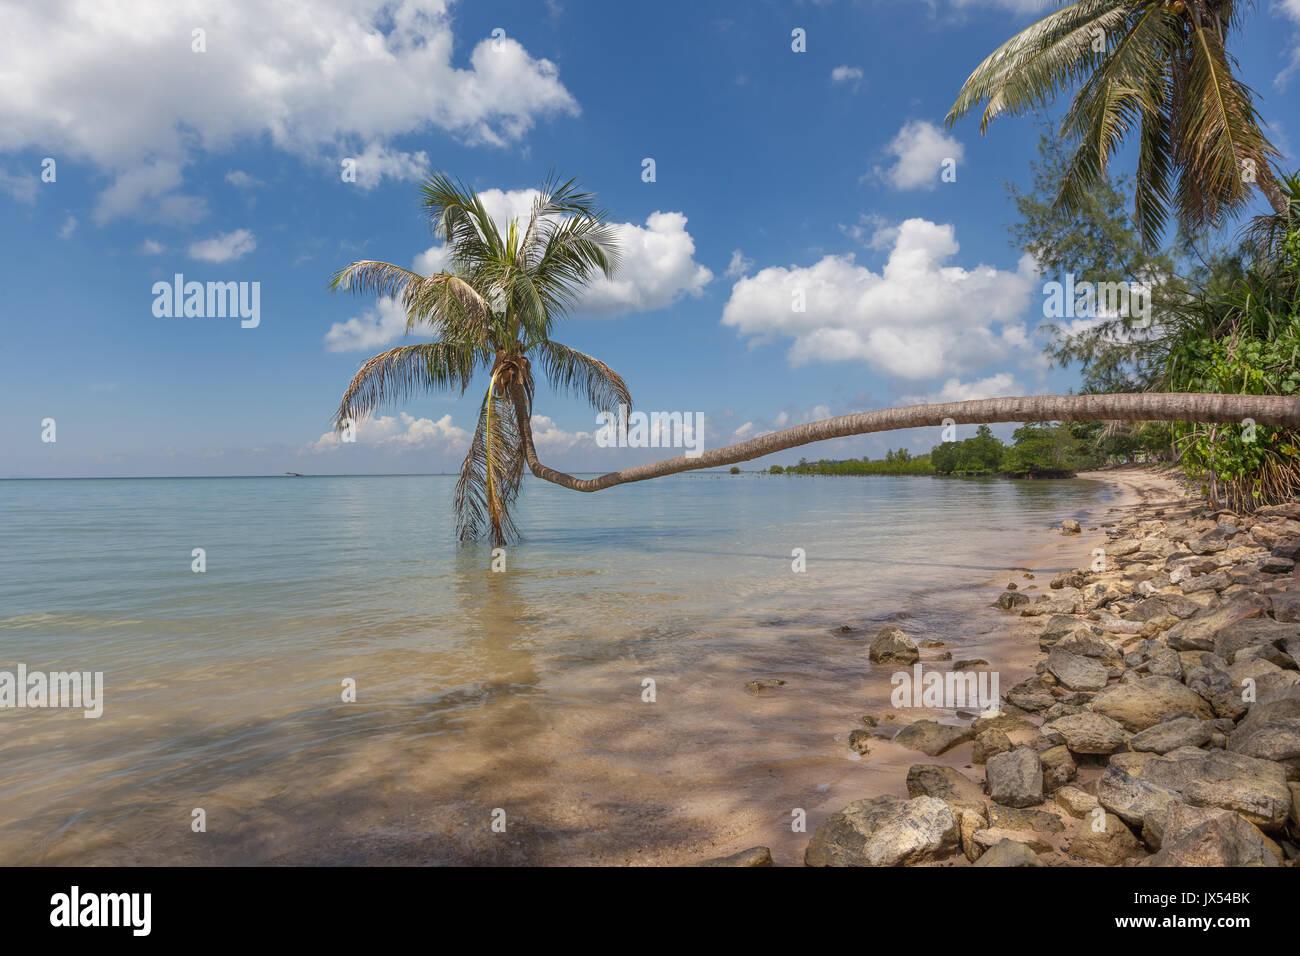 A lone coconut palm tree against a blue sky at Hin Kong Beach, Koh Phangan, Thailand - Stock Image